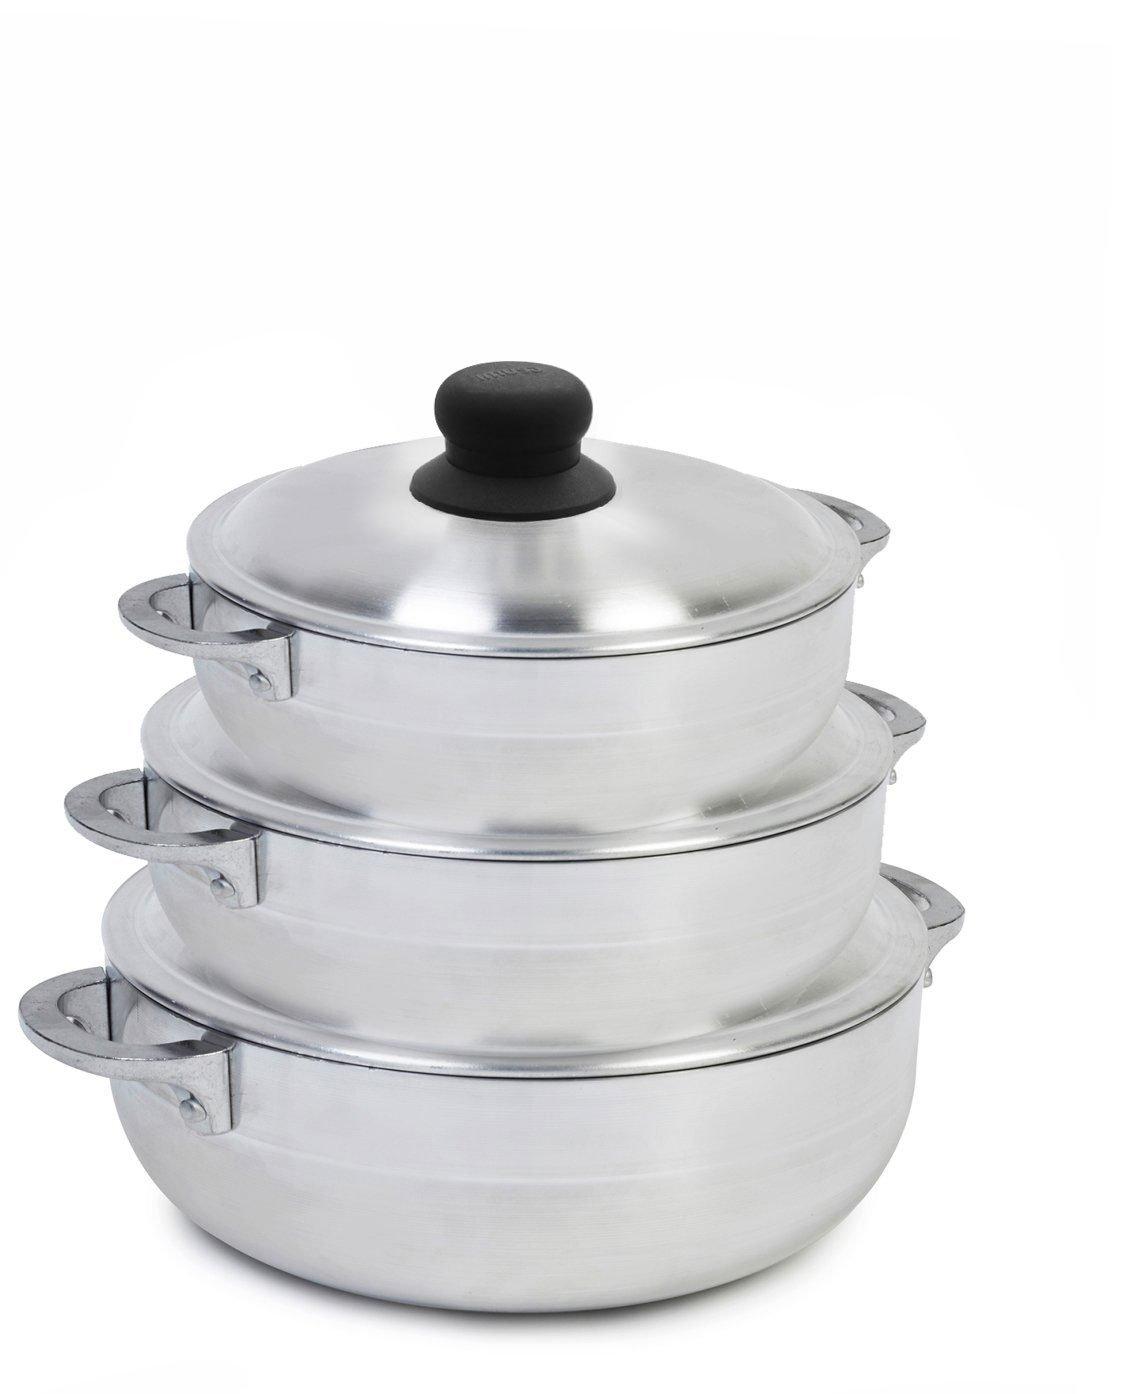 IMUSA USA GAU-89226 3 Piece Polish Aluminum Caldero Set, Silver (Dutch Oven Set) by Imusa